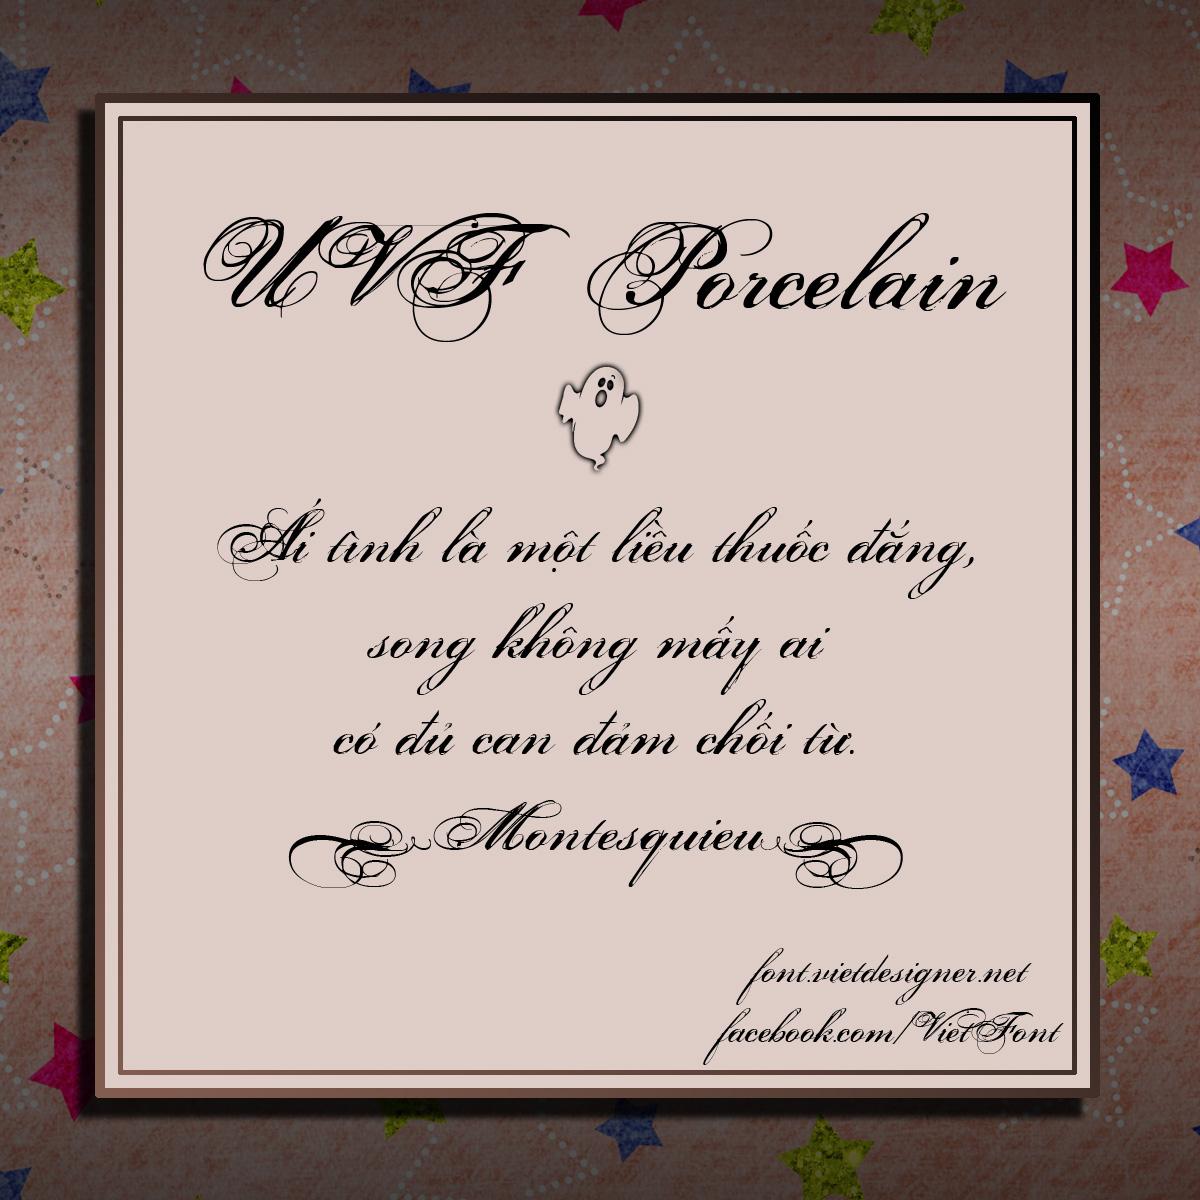 UVF Porcelain